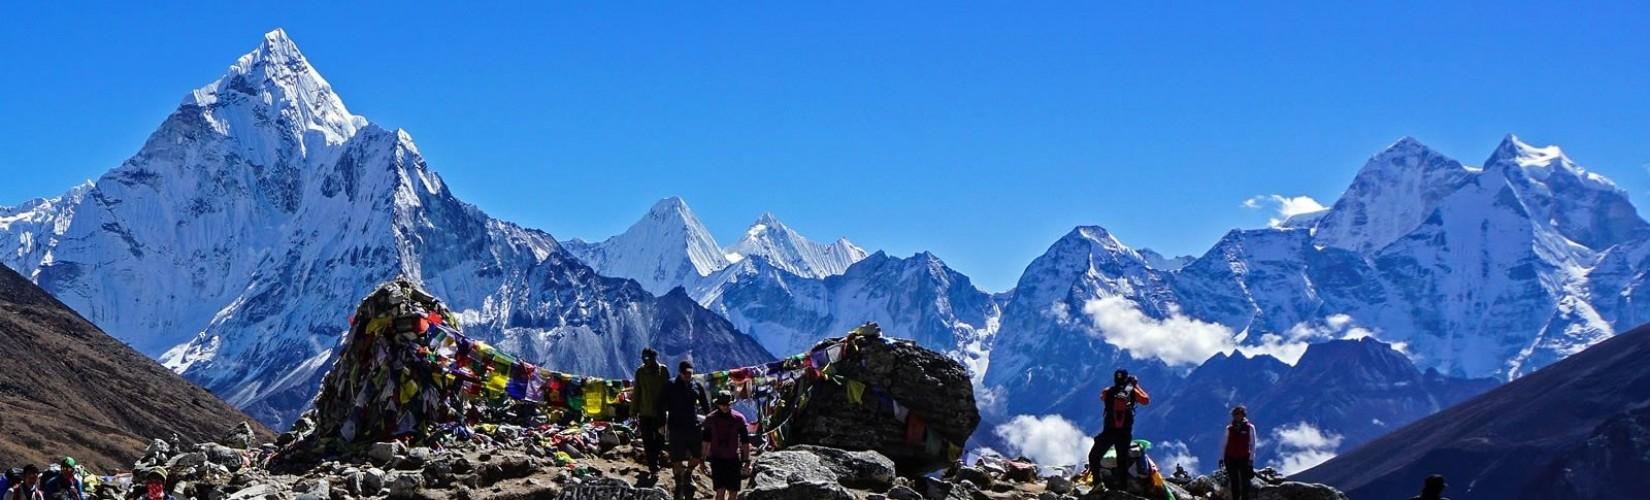 Everest Base Camp Trek in Spring